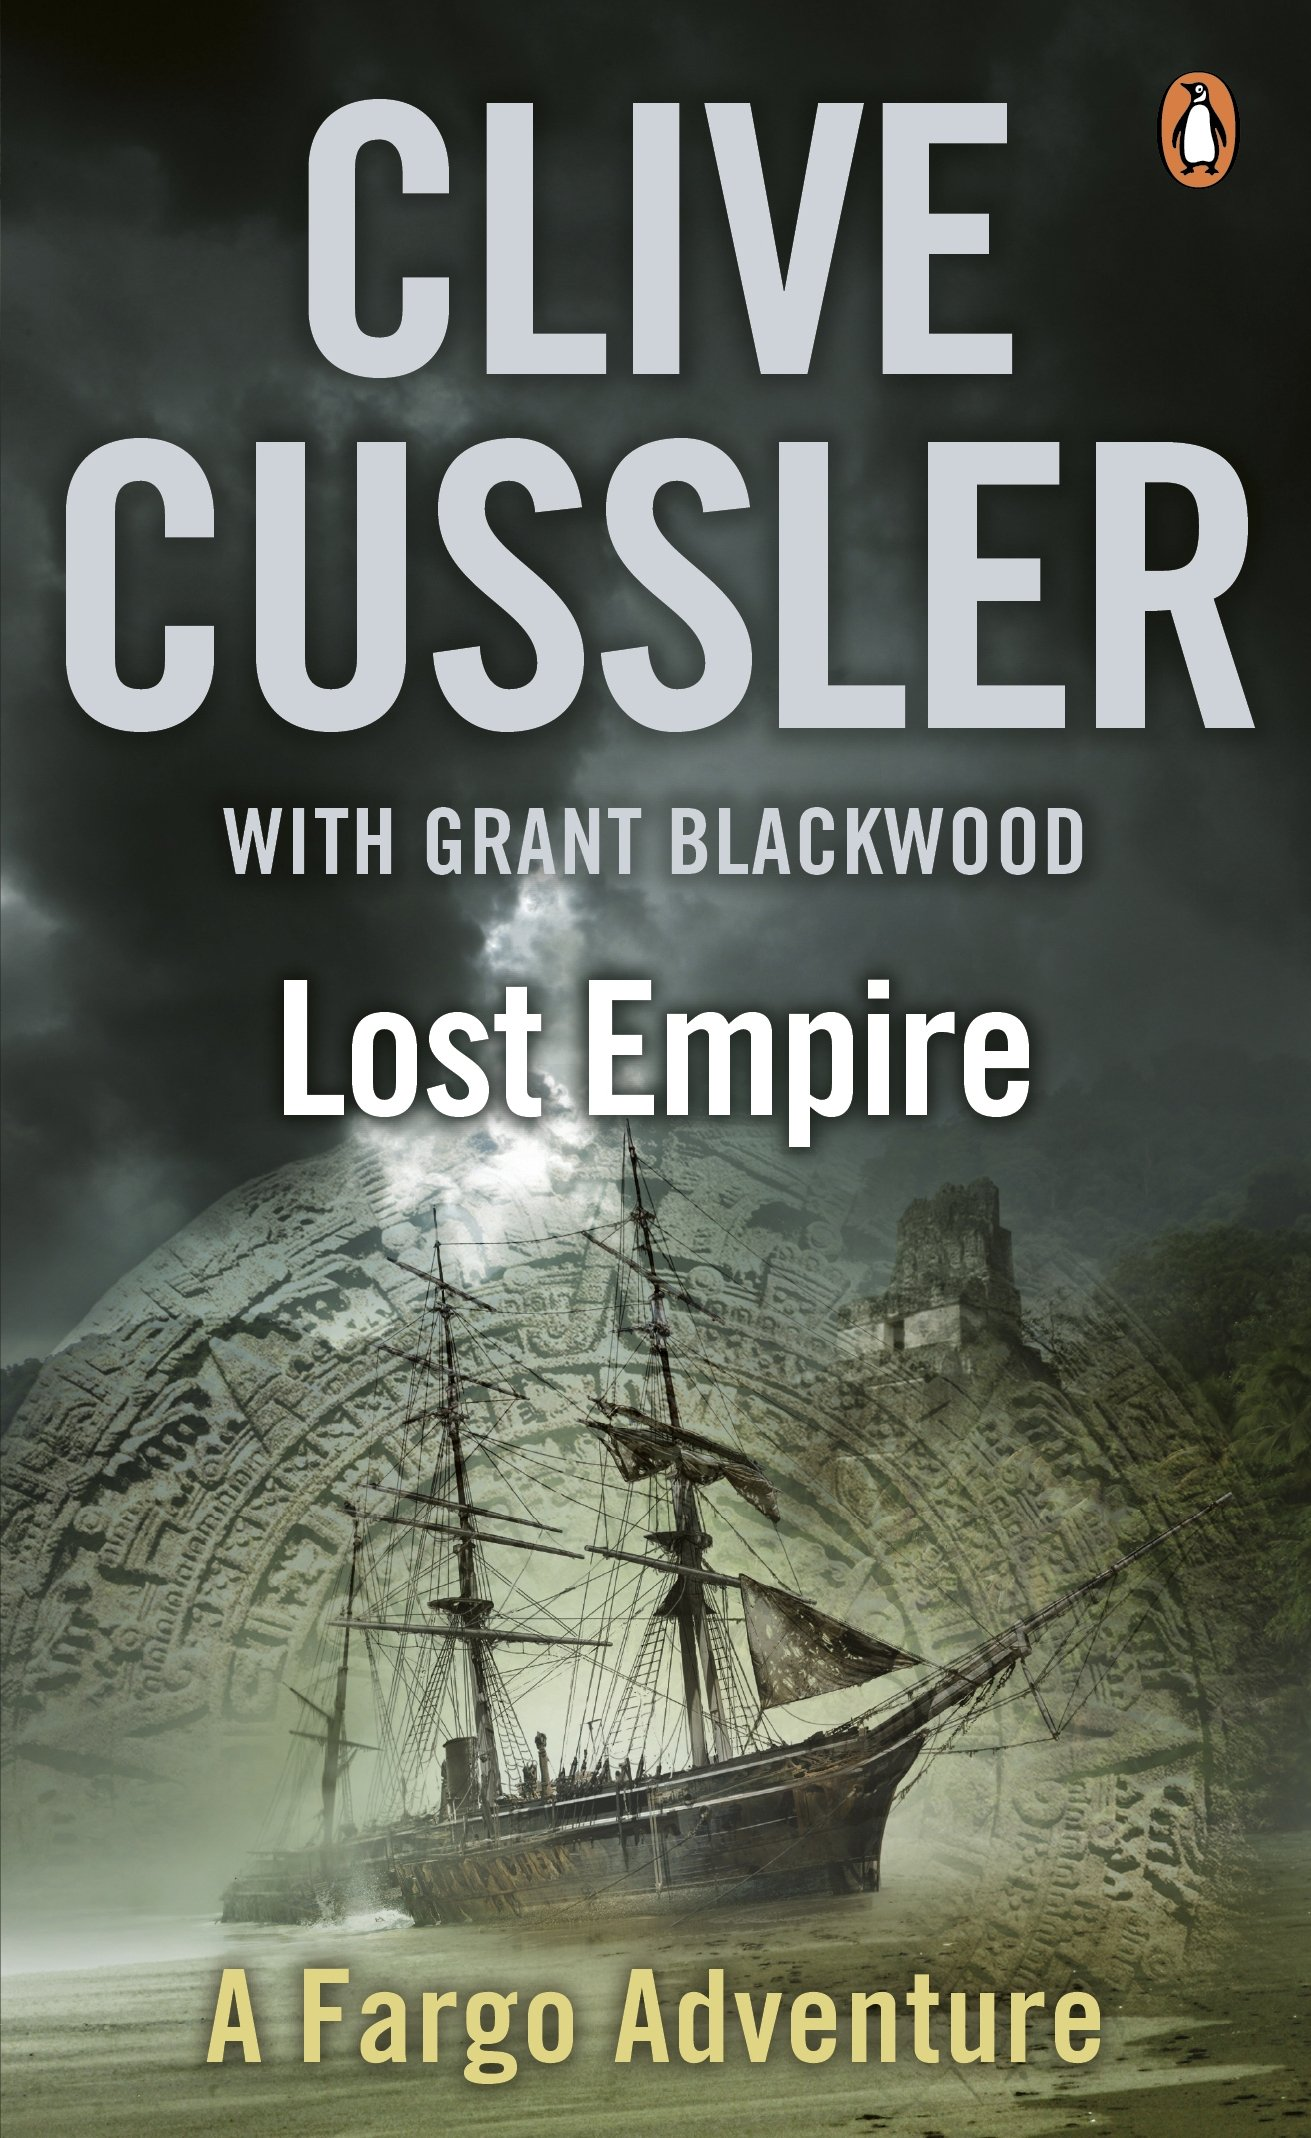 Lost Empire: FARGO Adventures #2: Amazon.co.uk: Clive Cussler, Grant  Blackwood: 9780241955352: Books